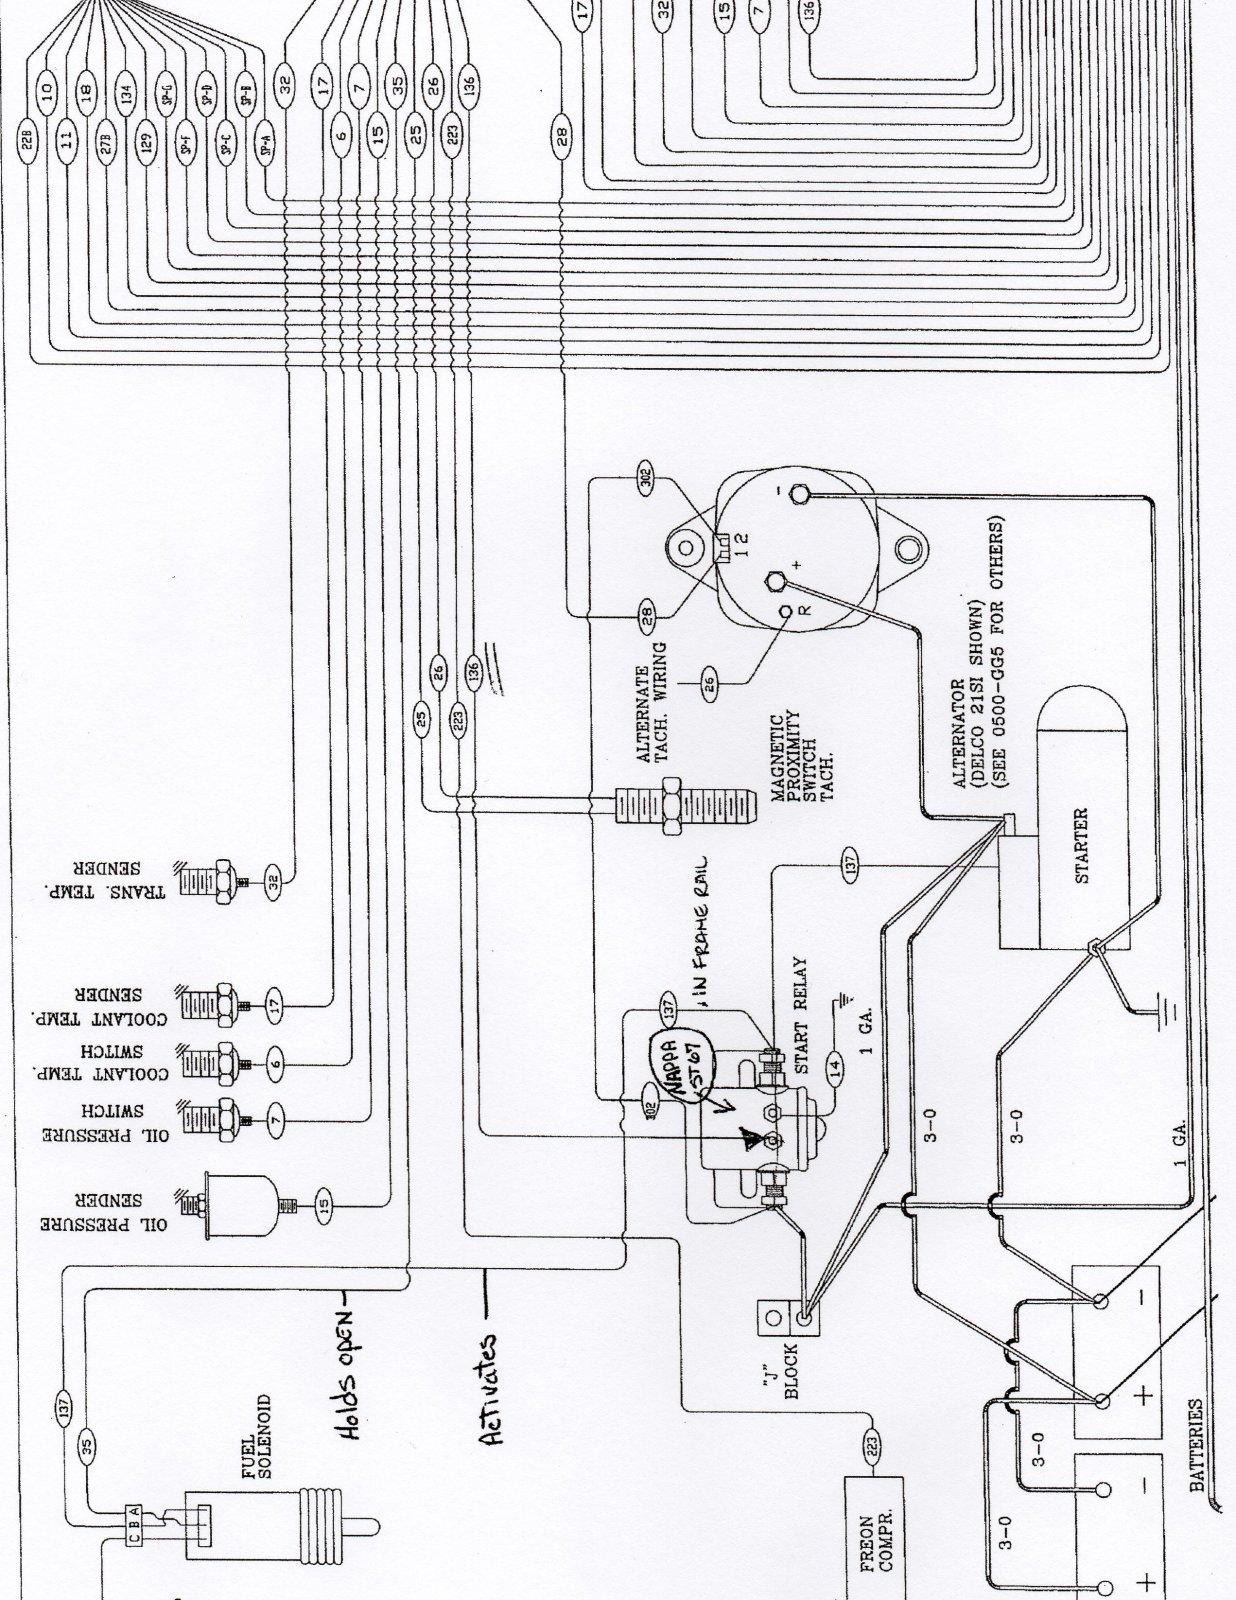 freightliner bus chis wiring diagrams freightliner discover your freightliner chassis wiring diagram kjg